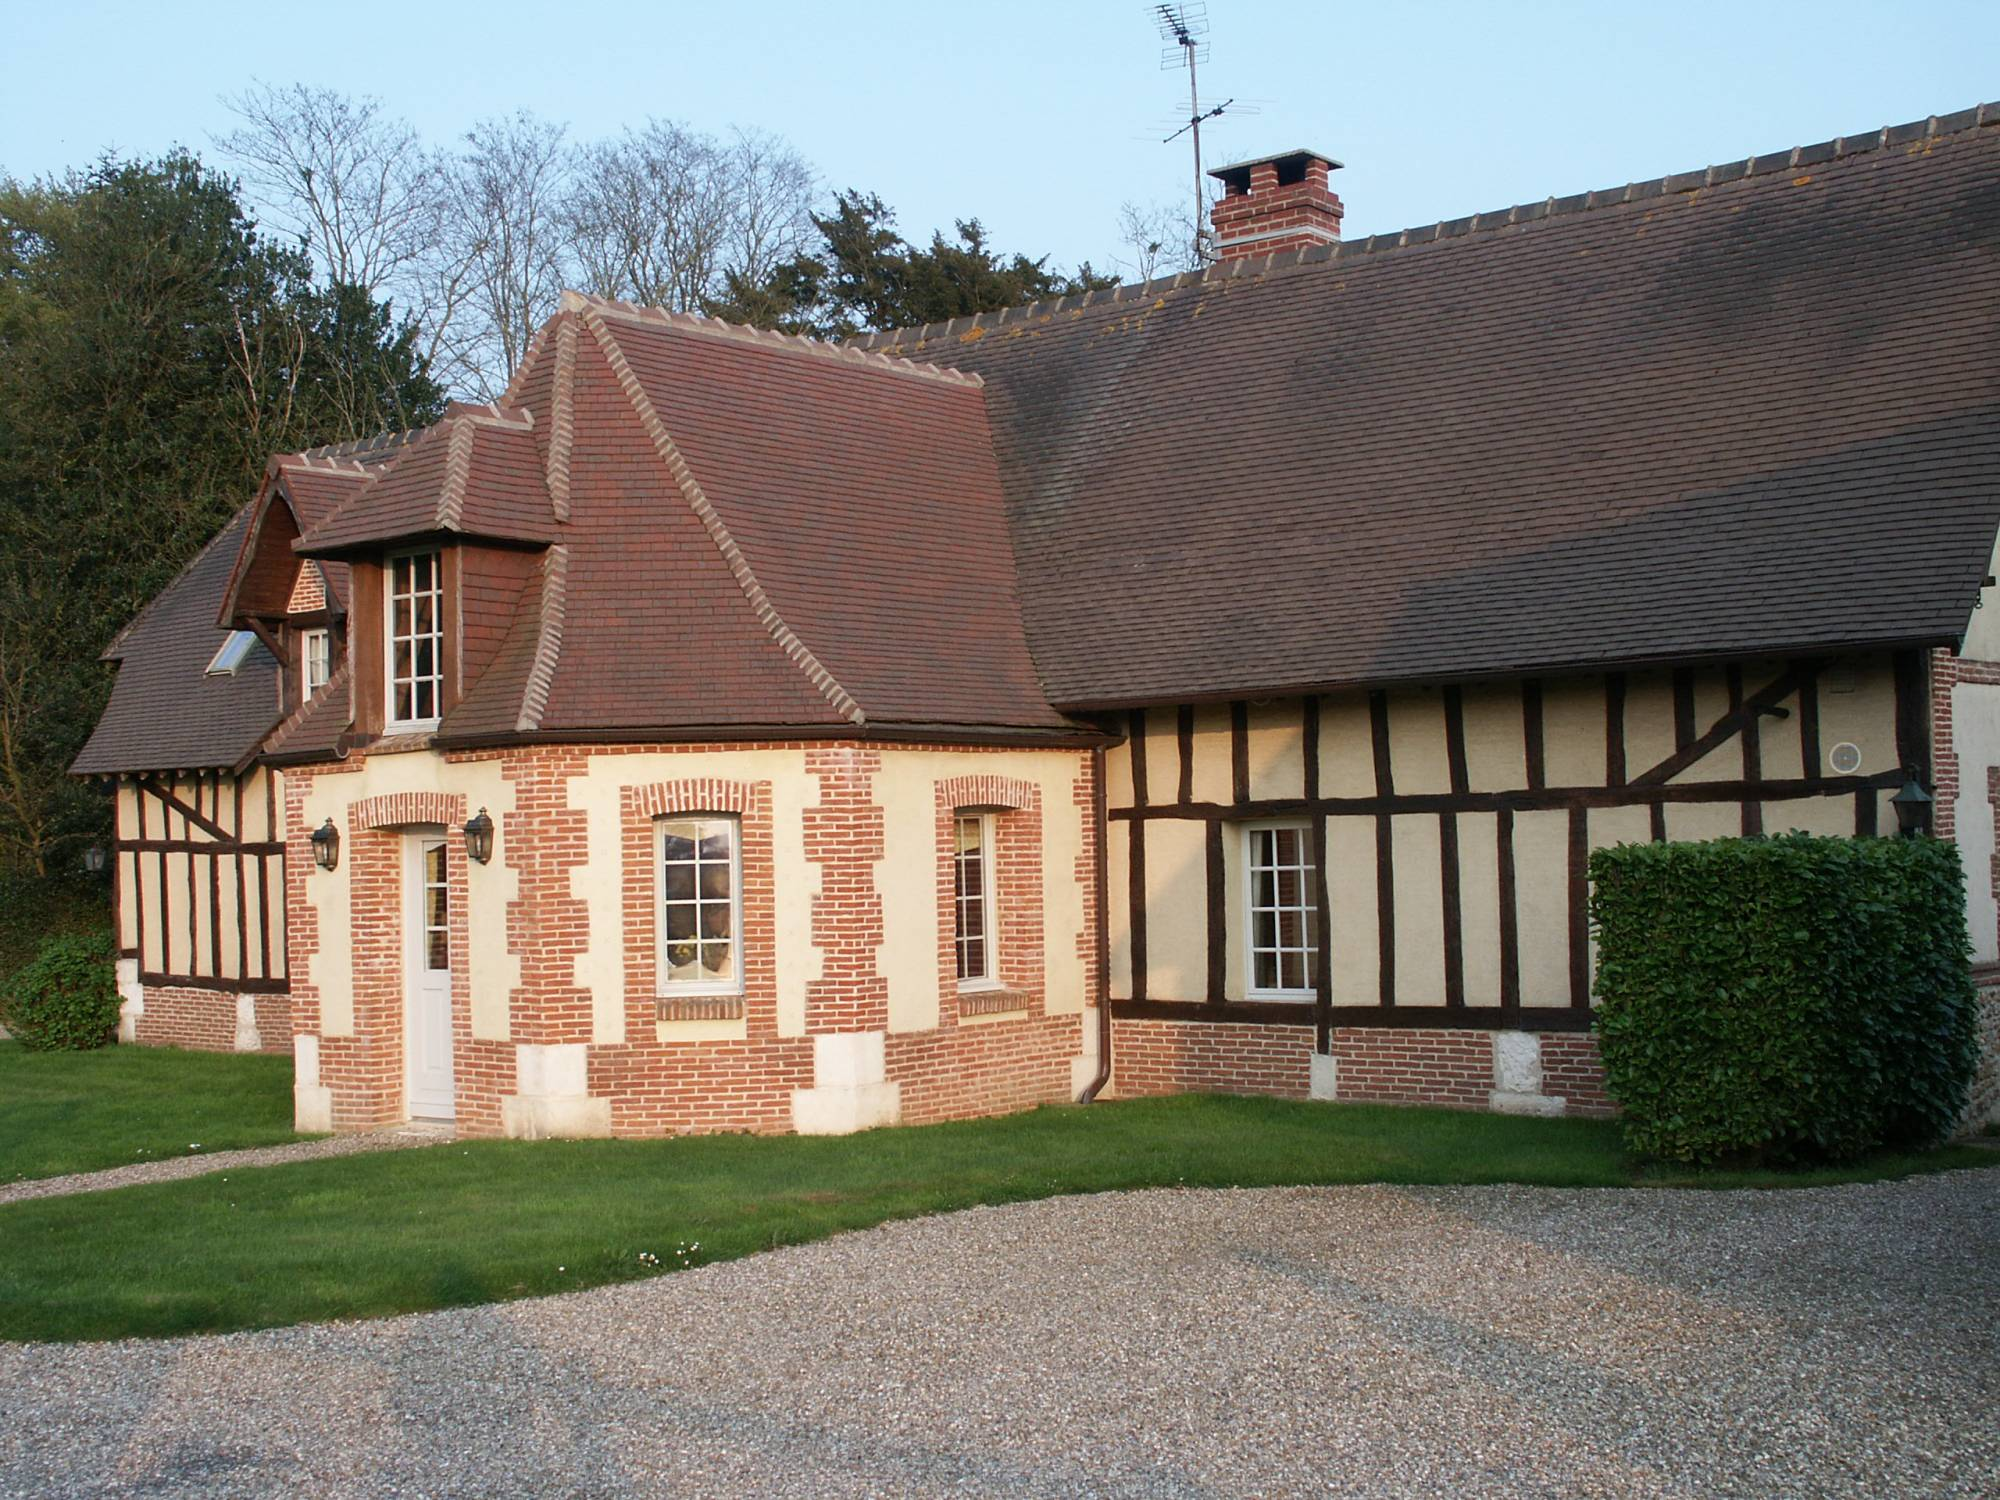 MAISON NORMANDE, Proche de Honfleur, Calvados 14600